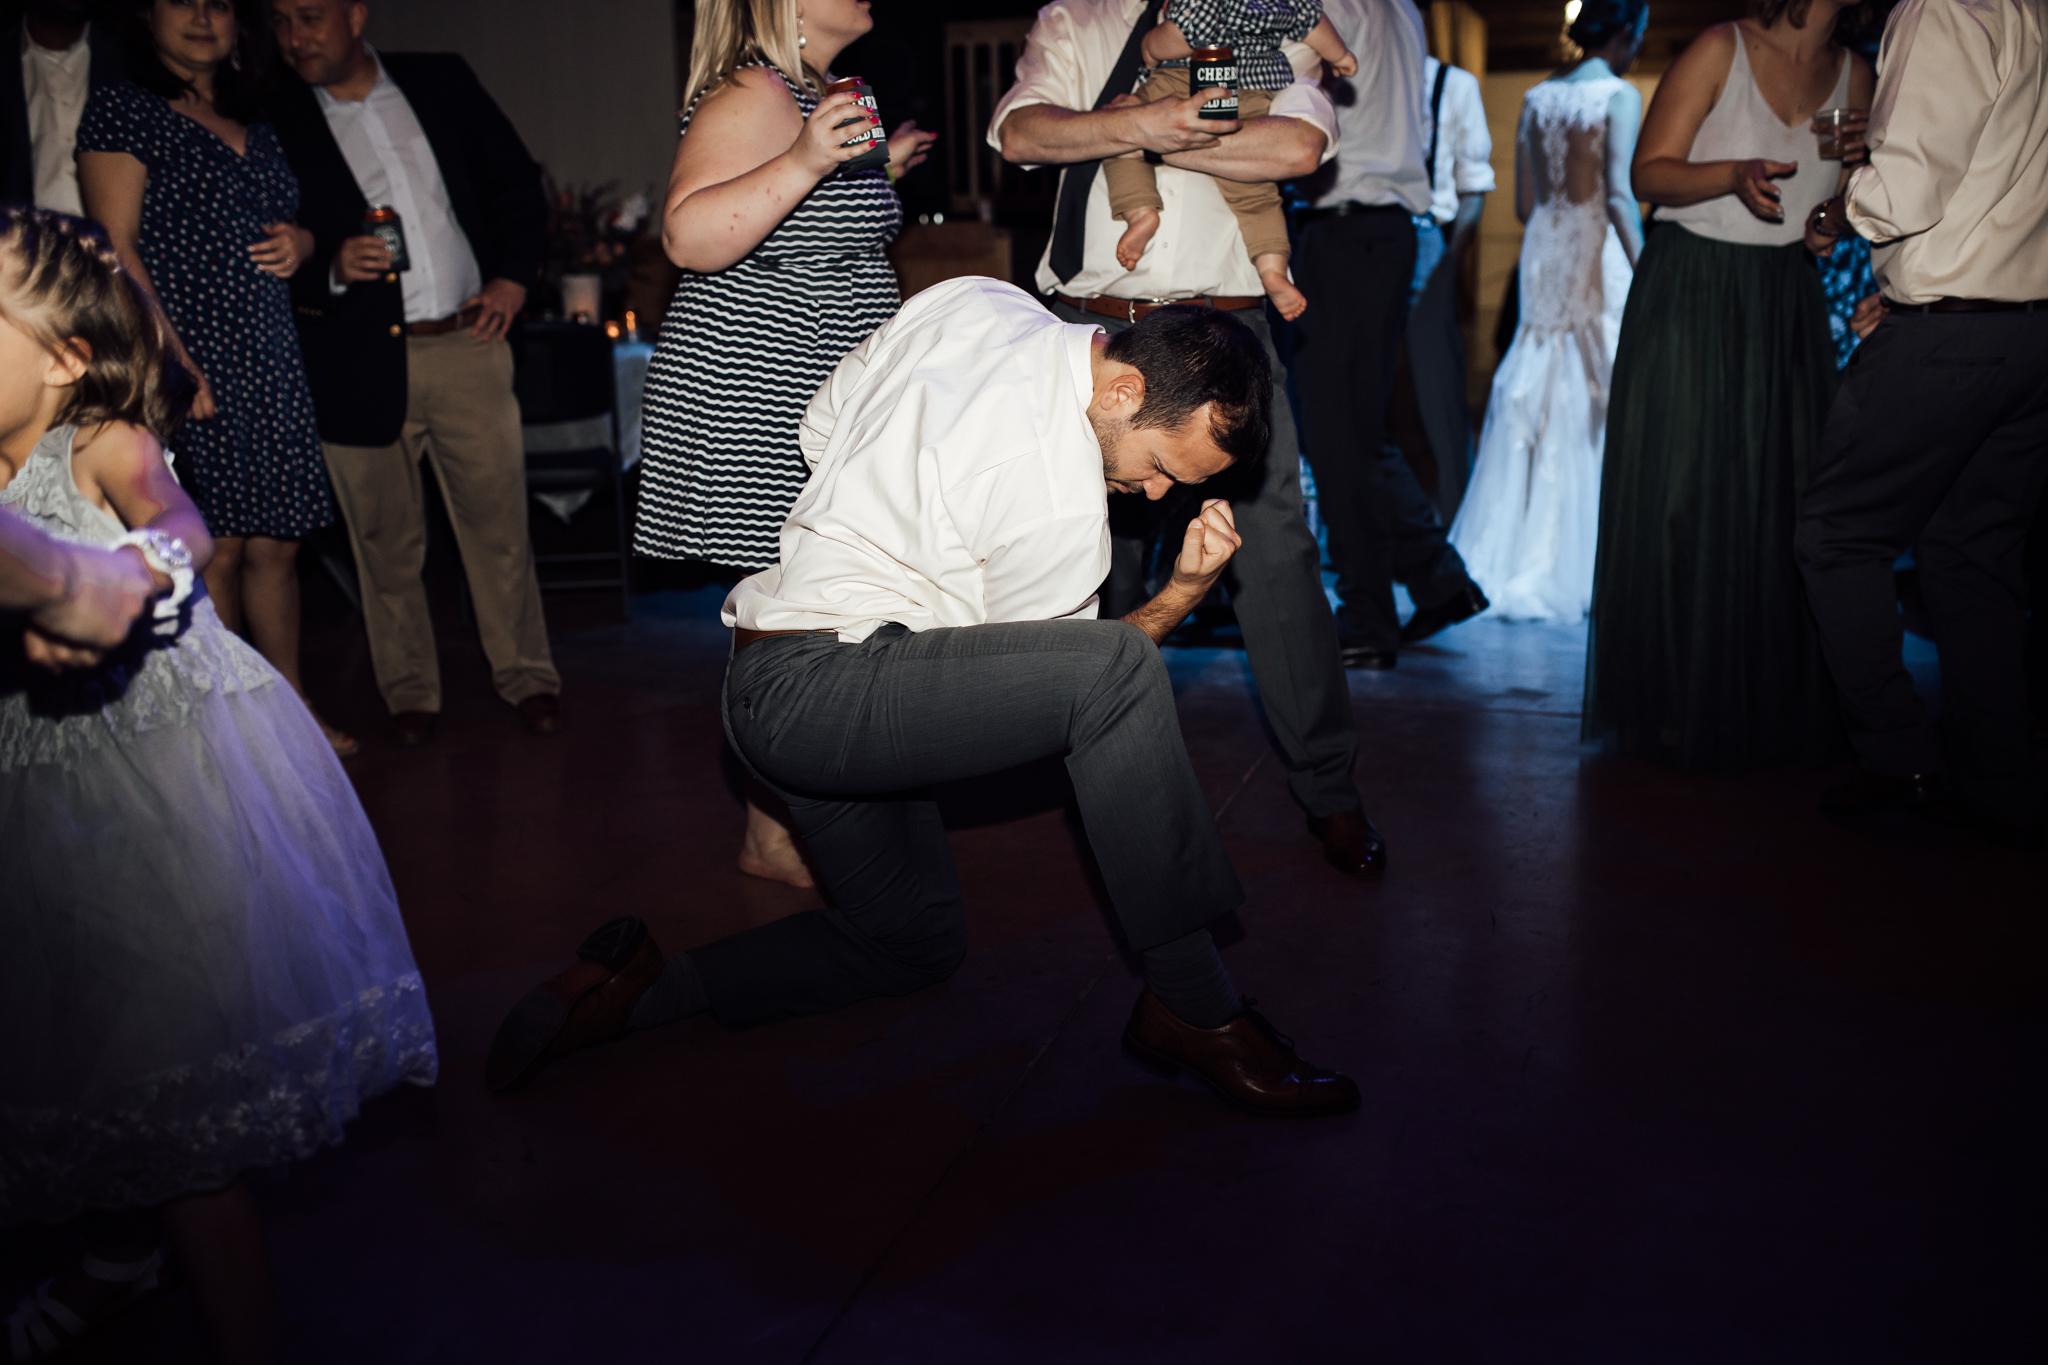 birmingham-alabama-wedding-photographer-laura-terry-the-warmth-around-you (103 of 110).jpg